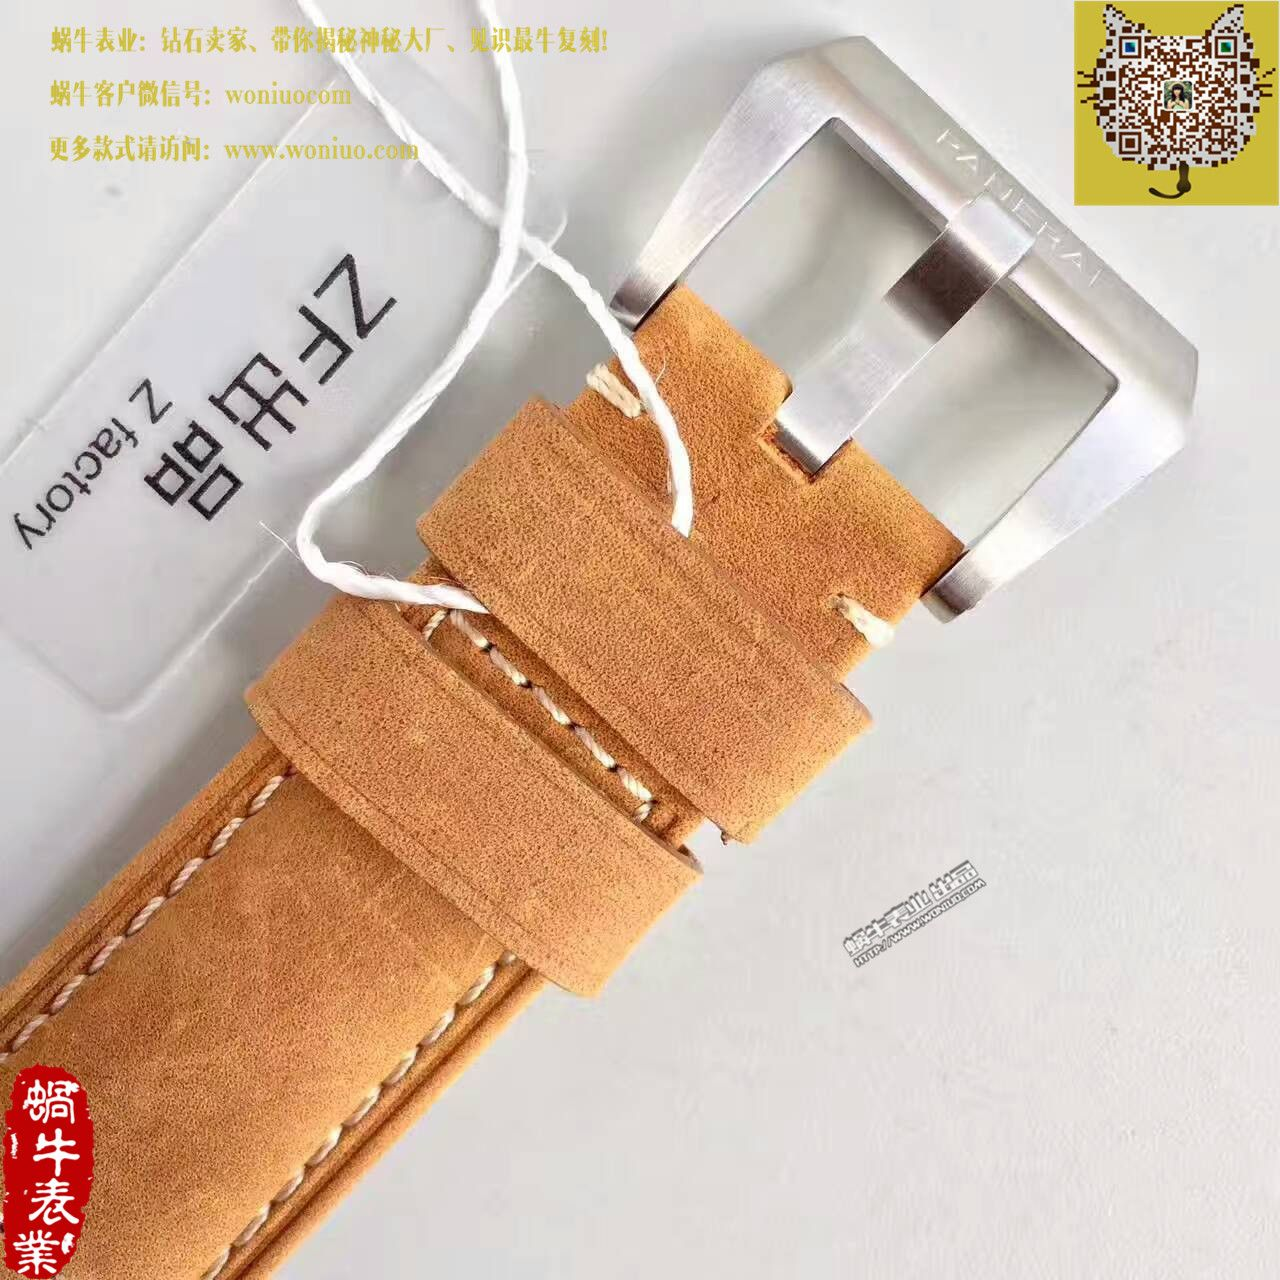 【ZF厂一比一超A高仿手表】沛纳海LUMINOR 1950系列PAM01523腕表 / PA005